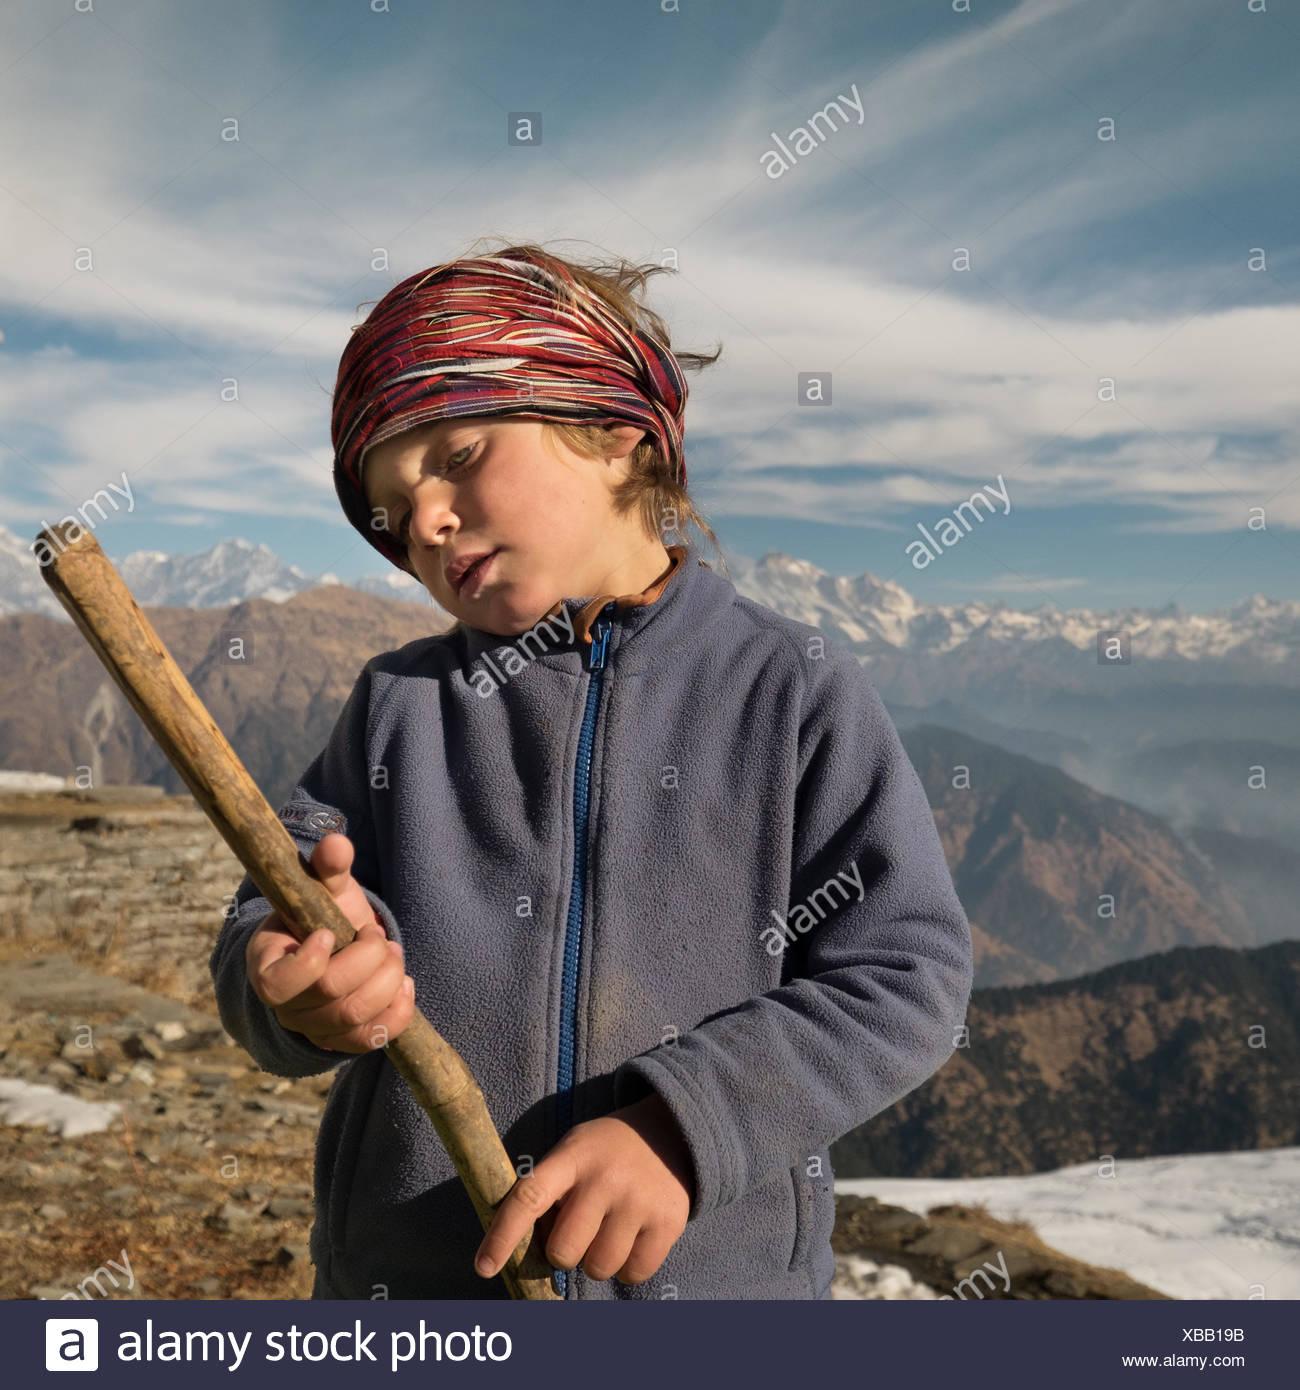 A European boy holds a wooden stick pretending it is a guitar. - Stock Image